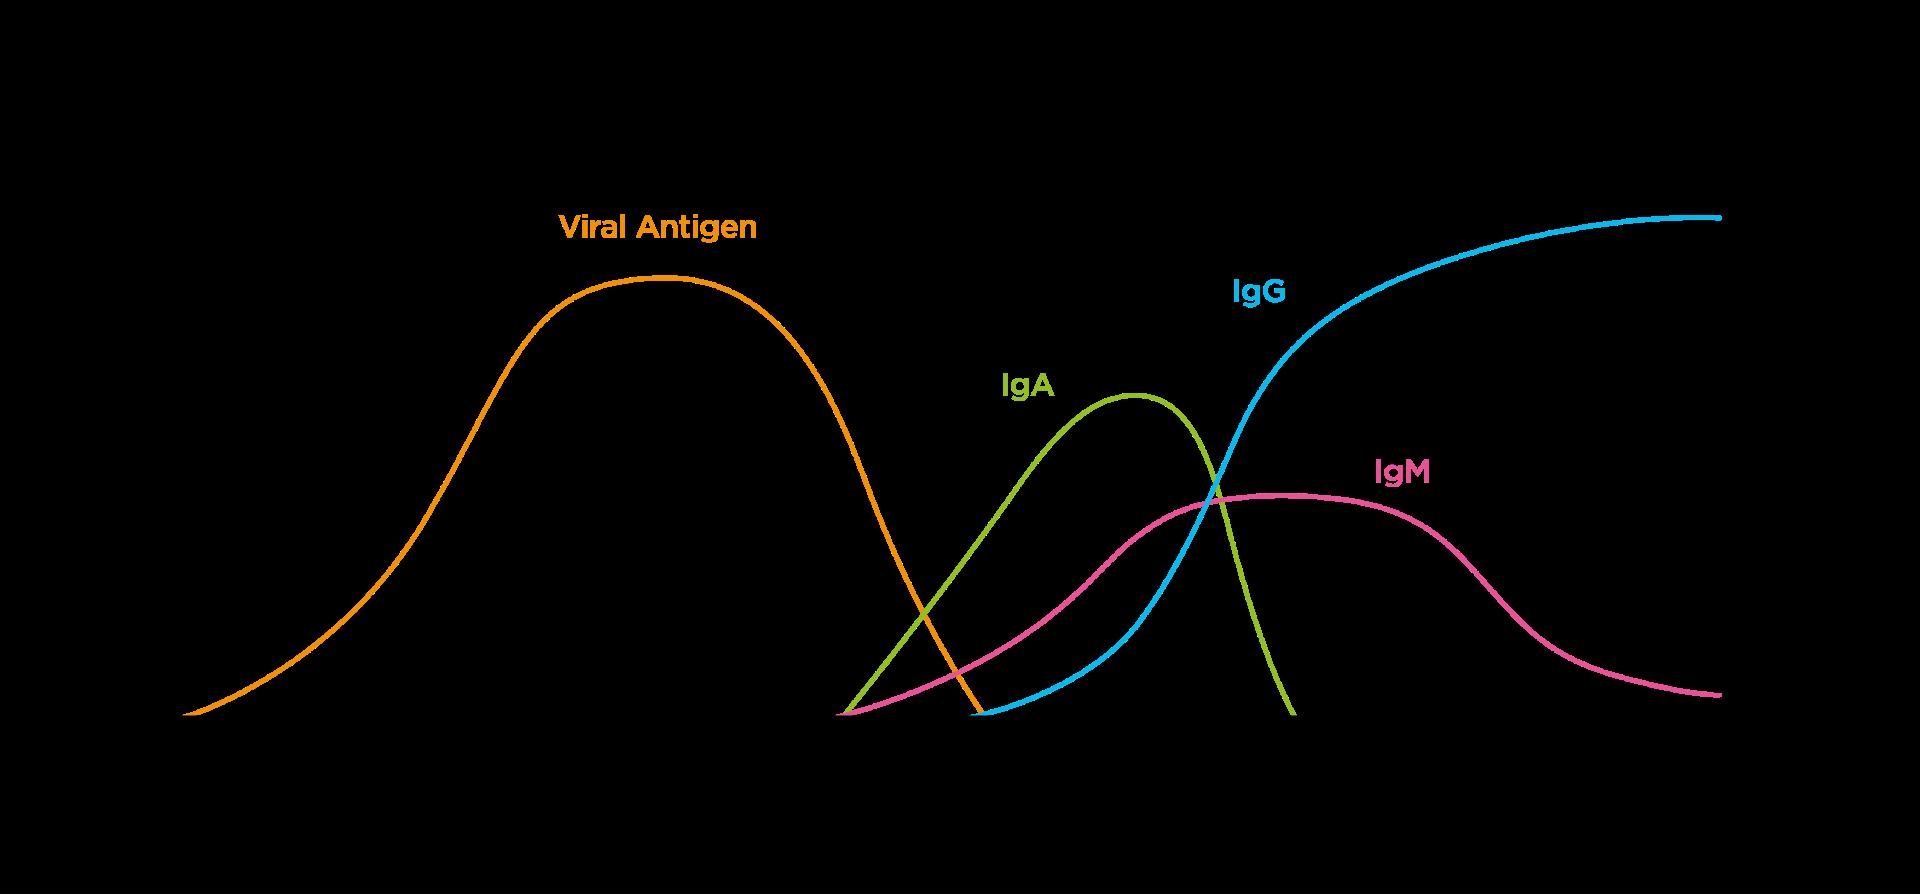 https://www.ibl-international.com/media/wysiwyg/products/db52181/SARS-CoV-2-RNA-Antigens-and-Antibody-Levels-graphic.png